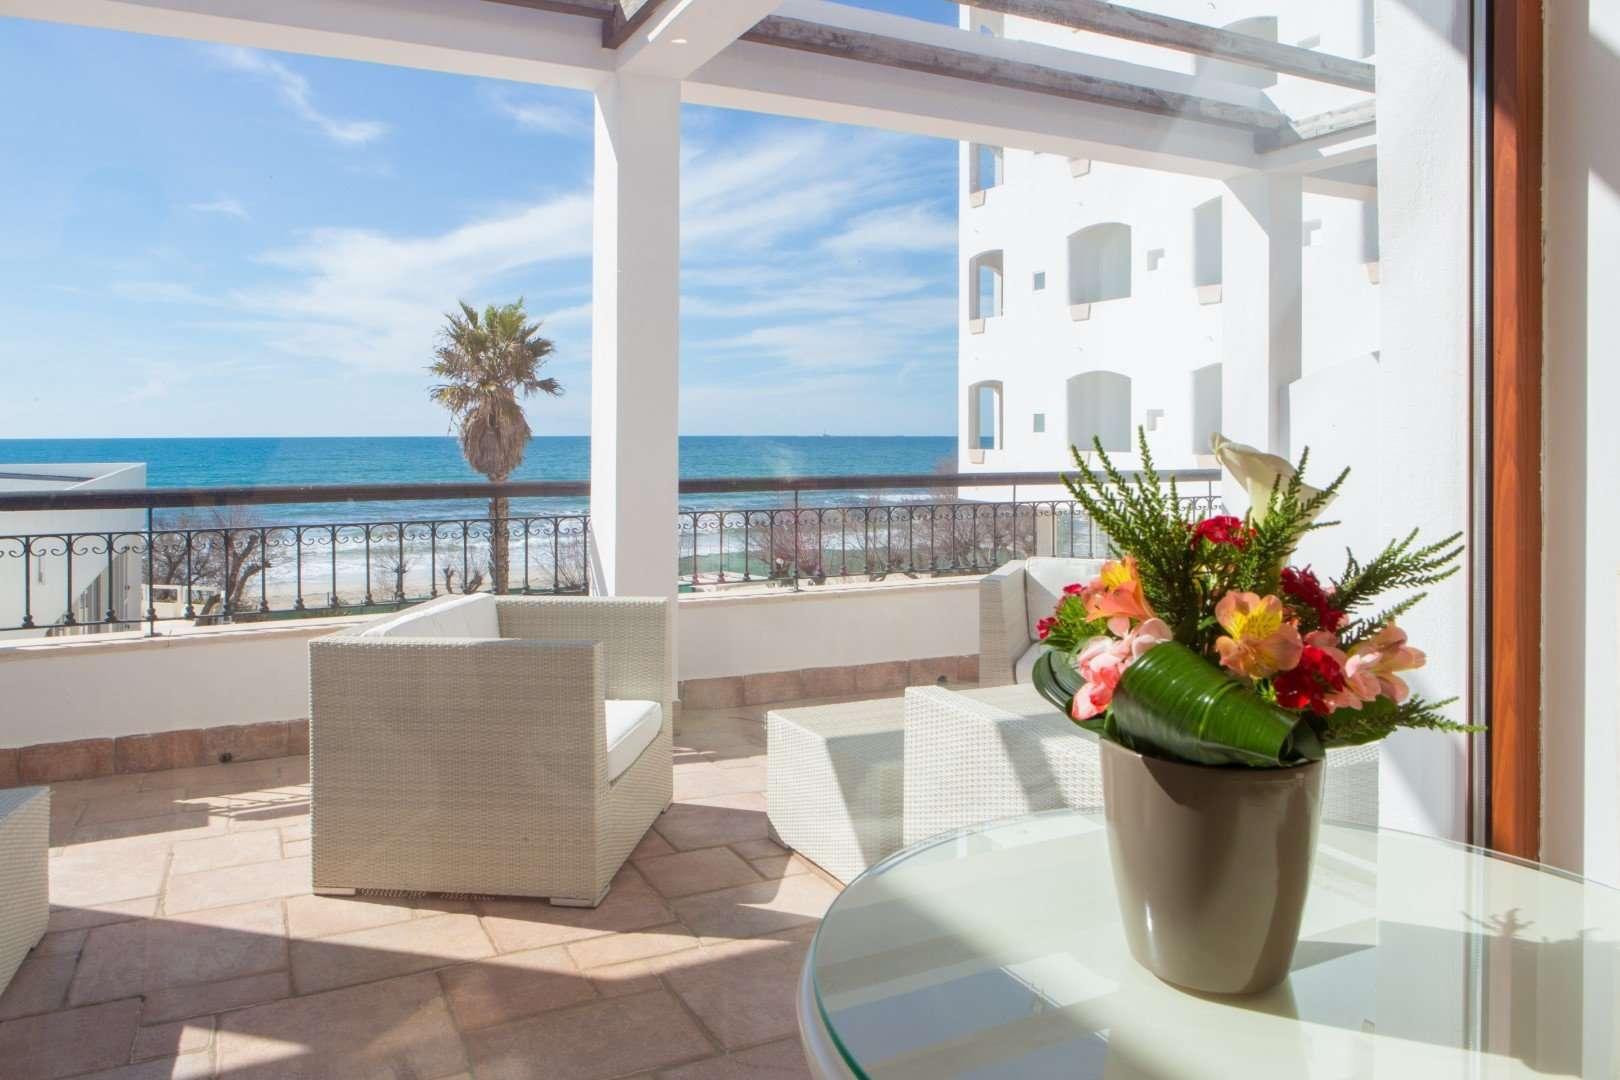 hotel costa brada - gallipoli - puglia - italie -zeezicht suite